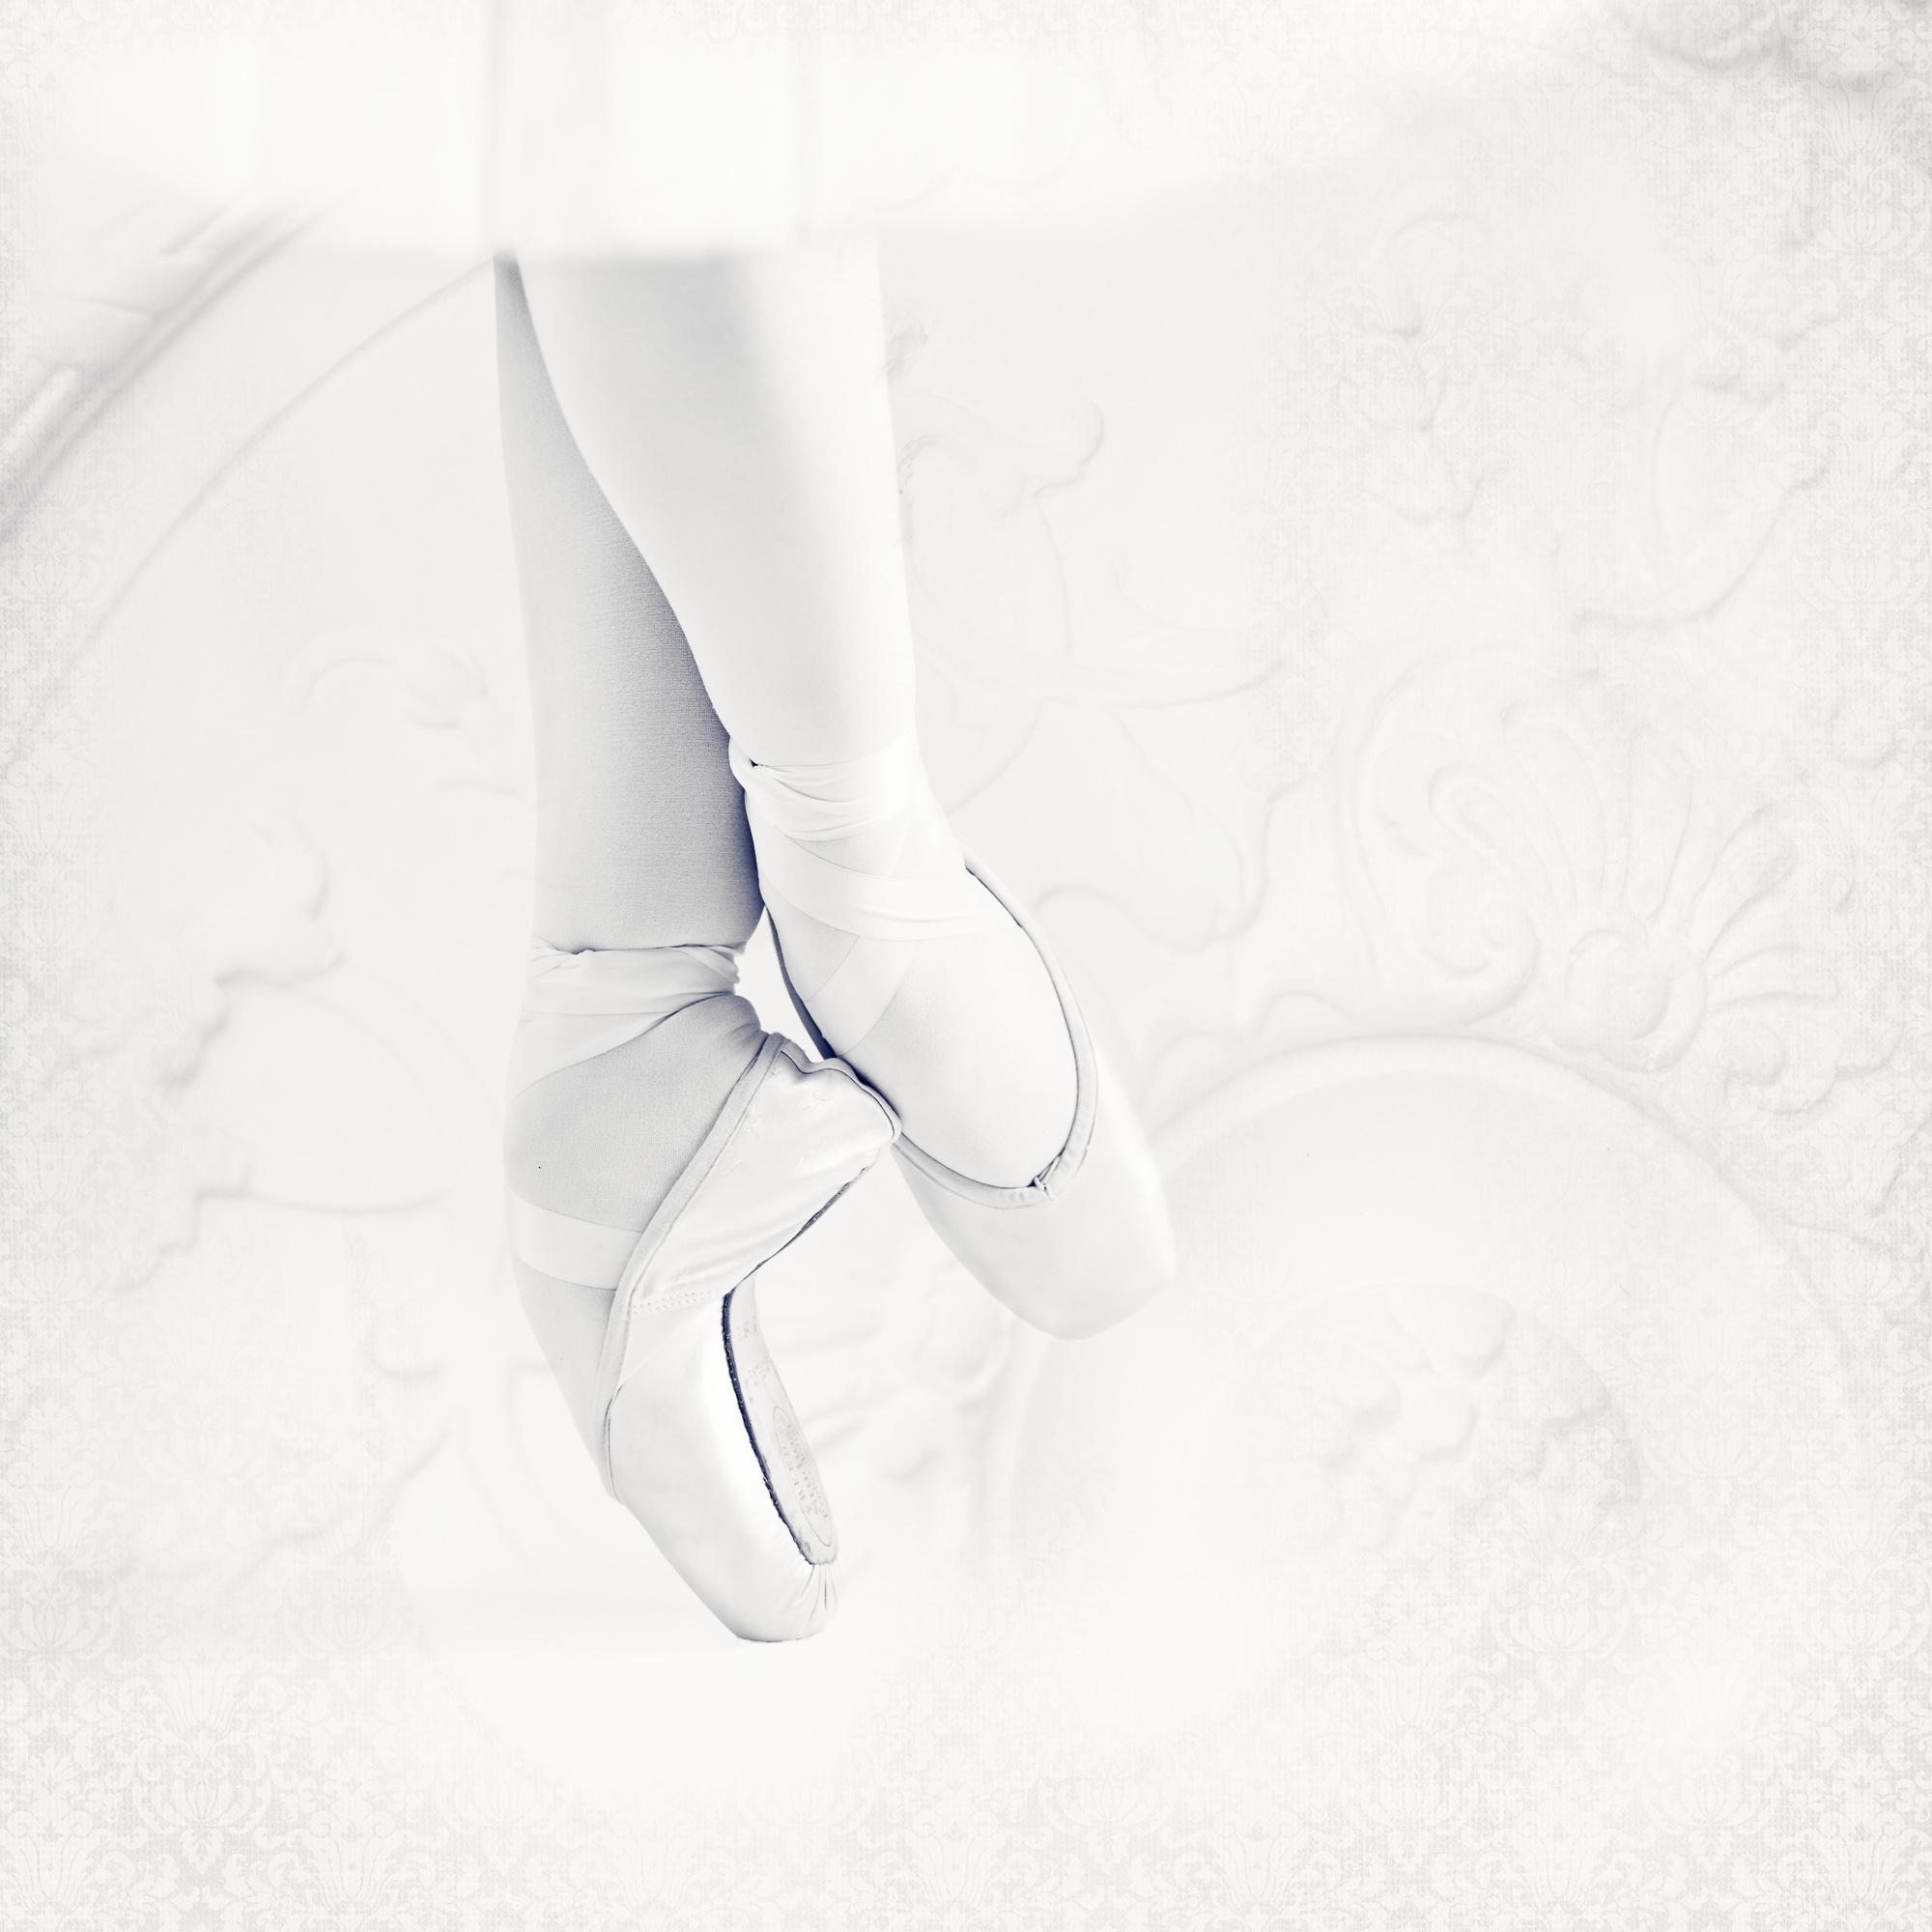 Ballerina Feet, In Paris. Black And White Fine Art Print, Home Decor Gift.